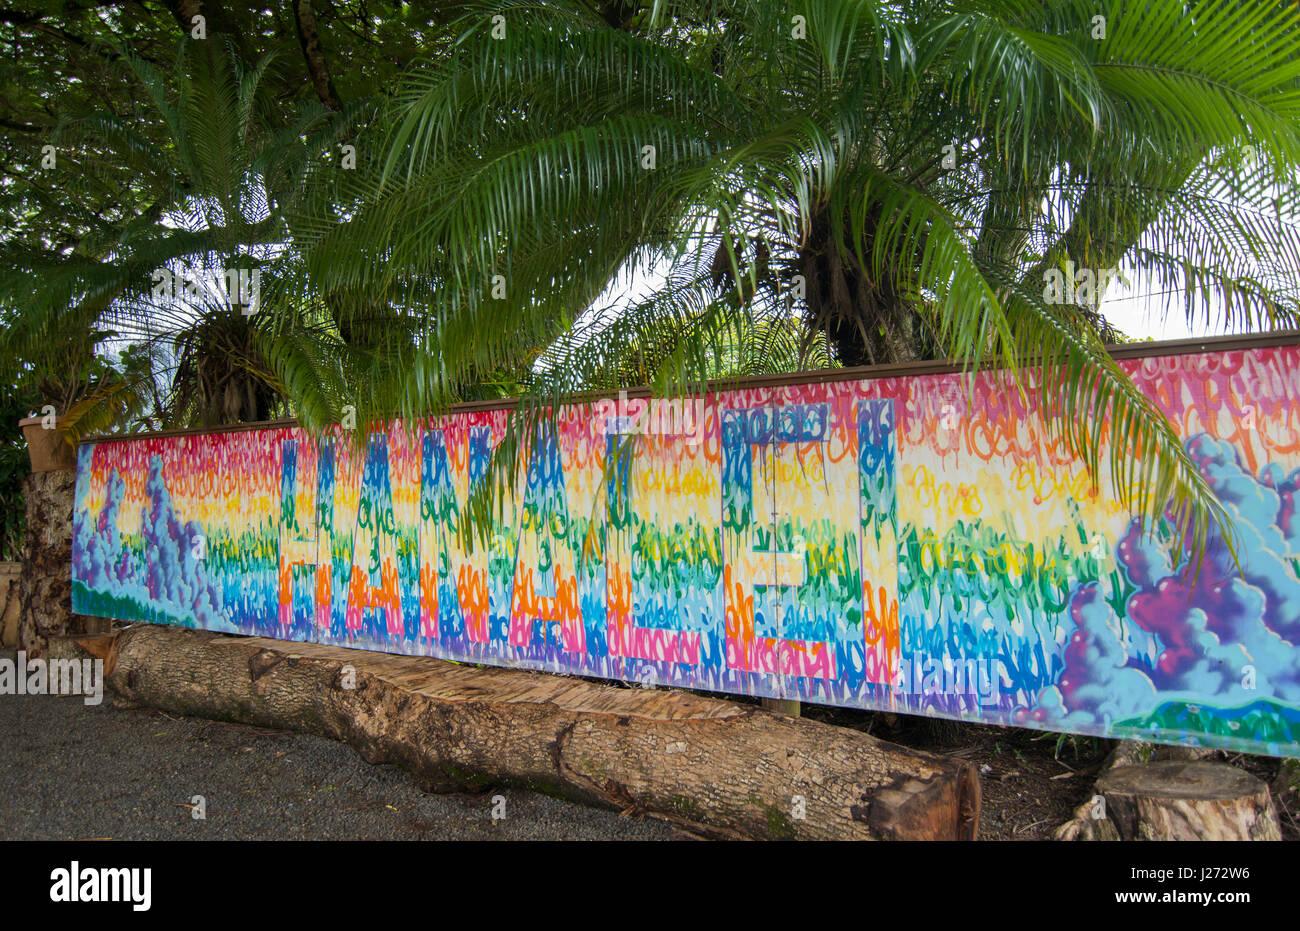 Hawaiian wall murals best 25 murals ideas on pinterest paint hanalei kauai hawaii colorful mural sign tile on wall north shore hanalei kauai hawaii colorful mural amipublicfo Image collections